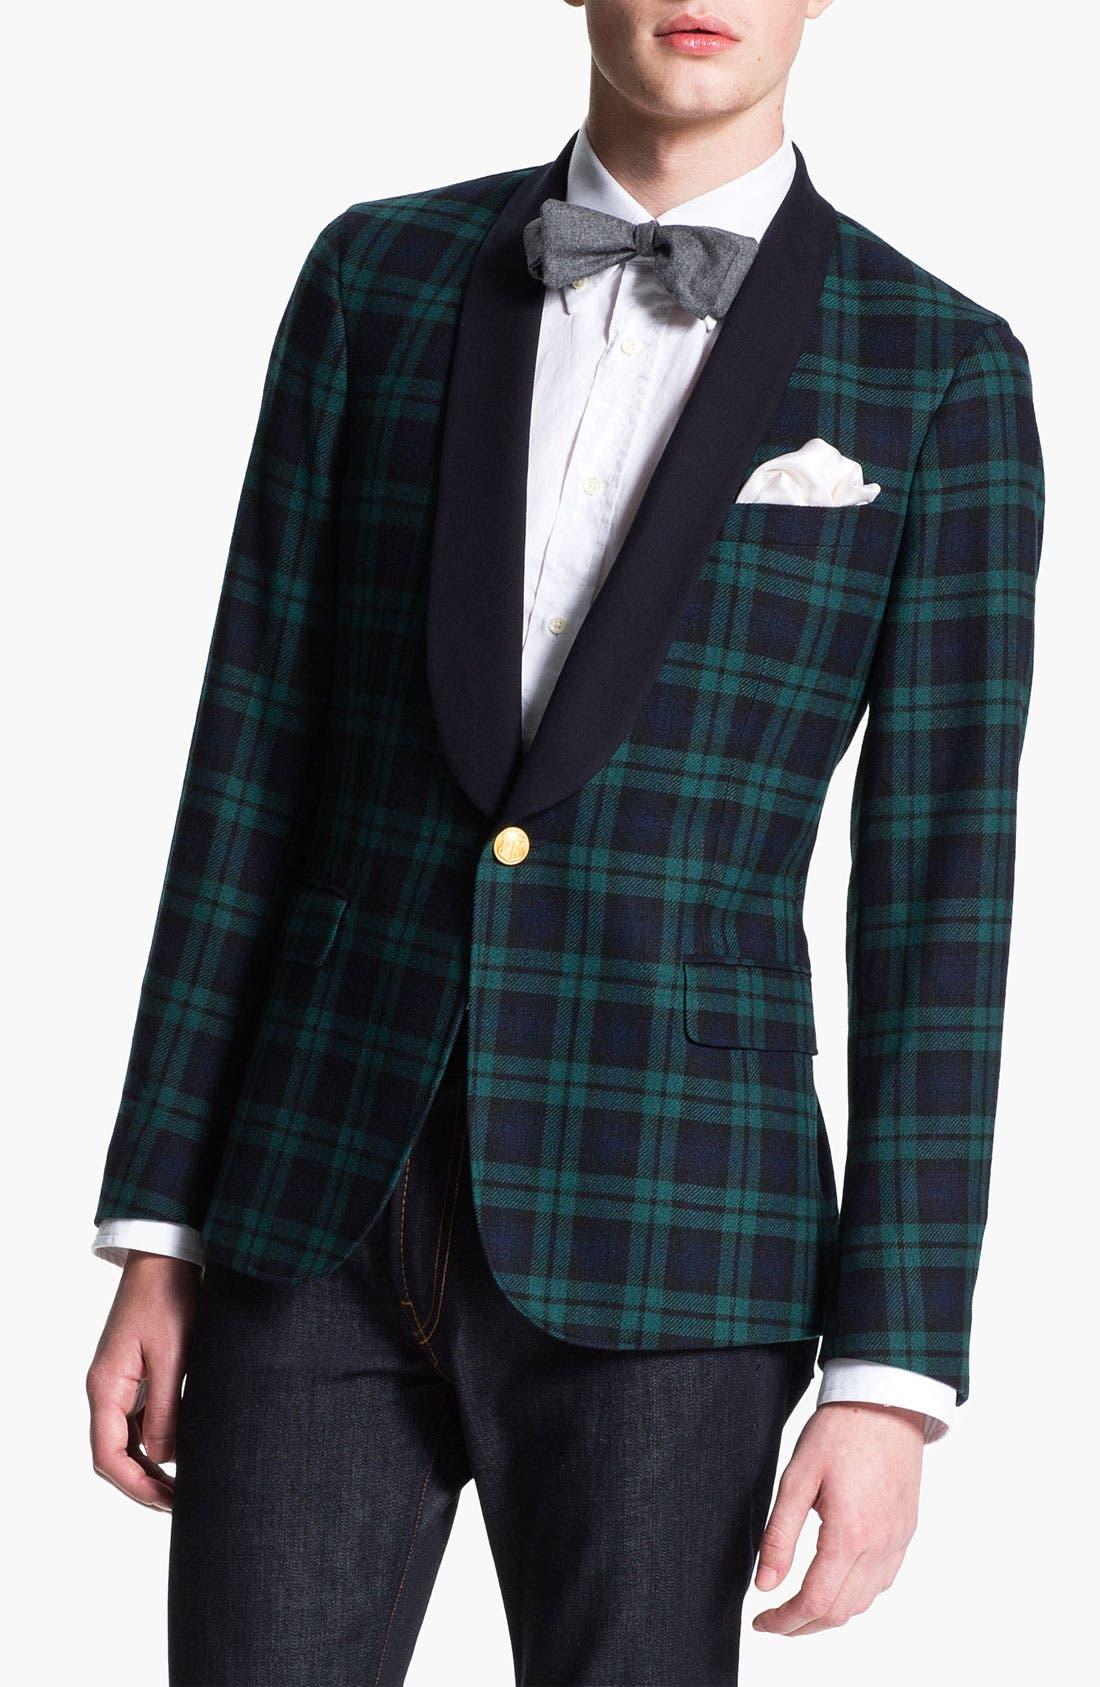 Alternate Image 1 Selected - Gant Rugger 'Black Watch Tux' One Button Blazer